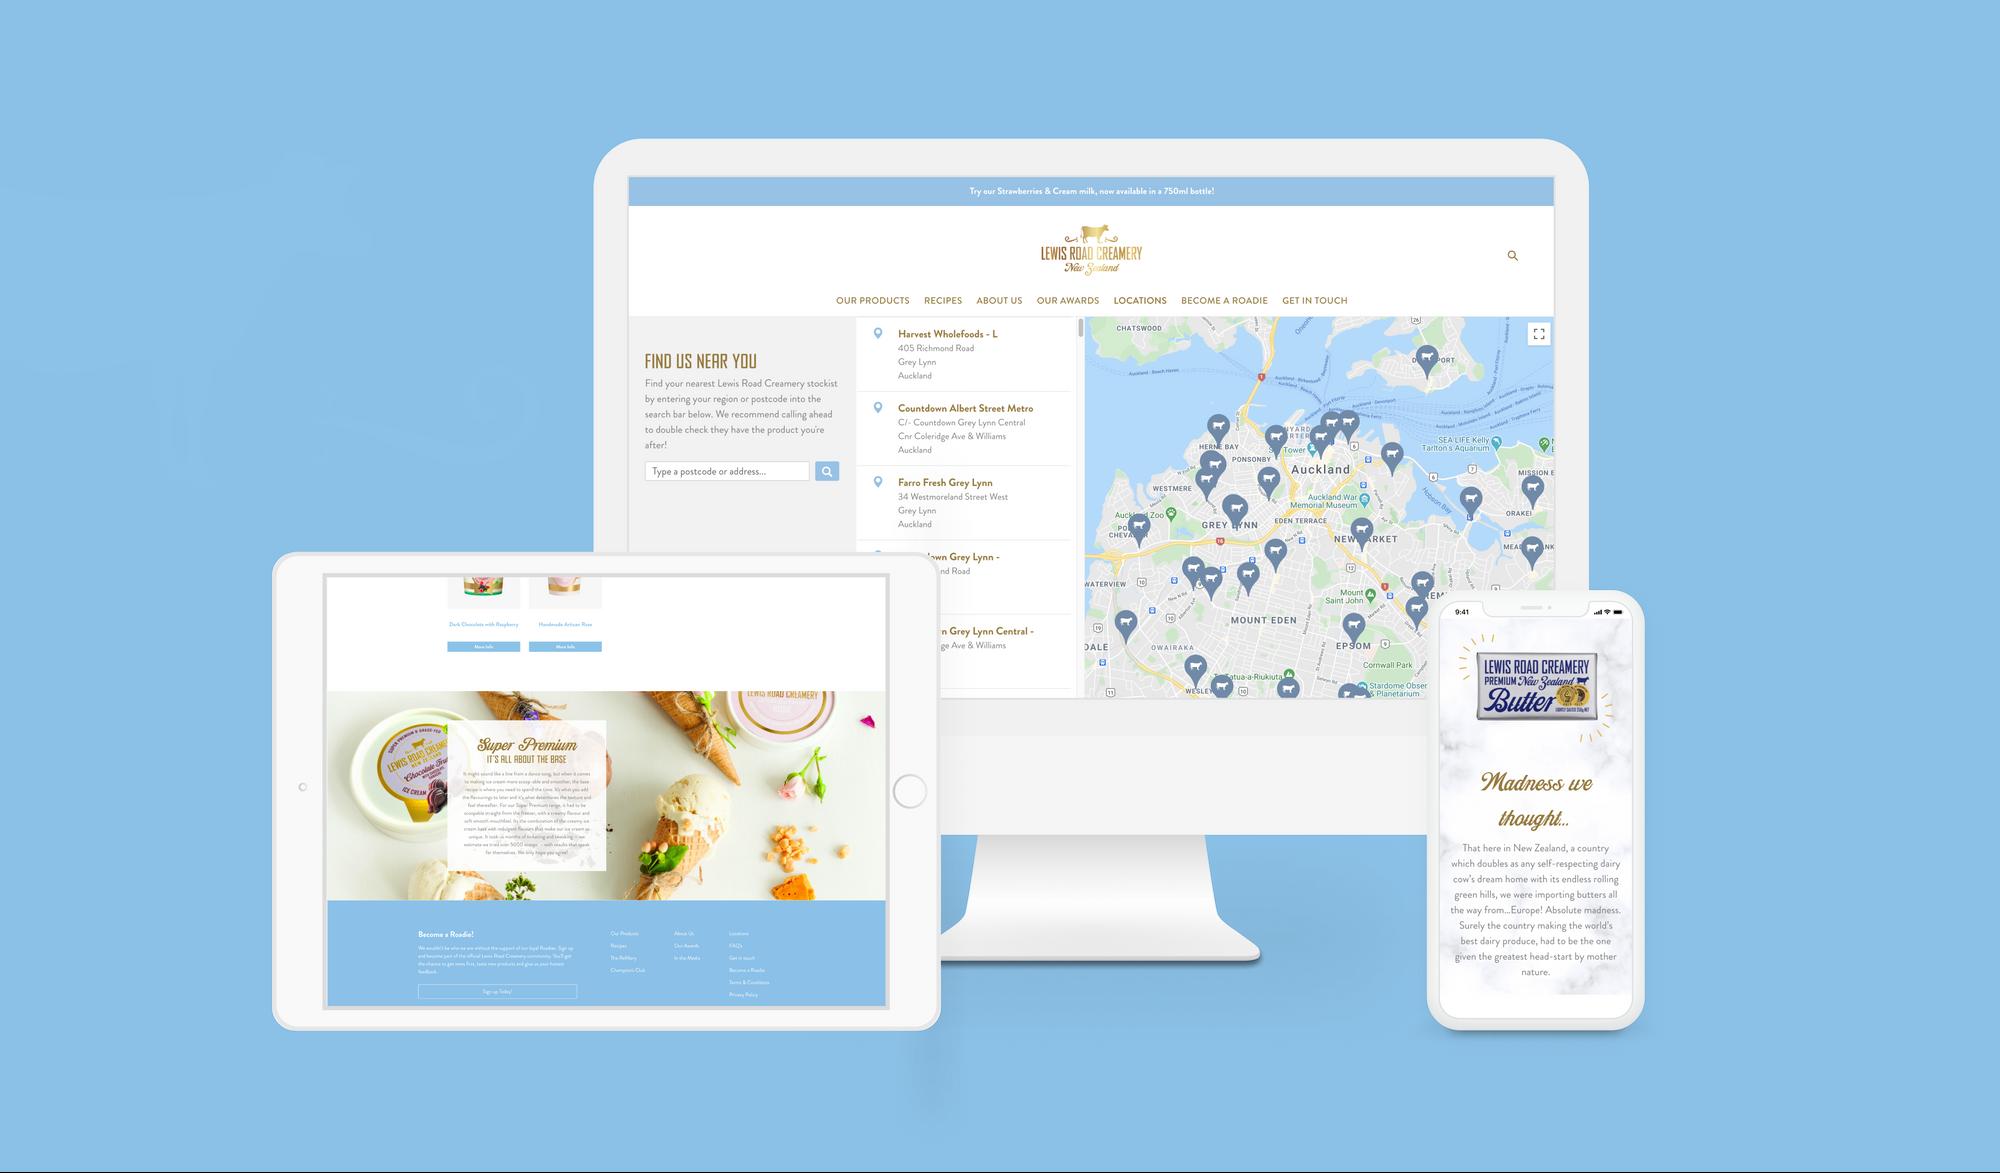 Lewis Road Creamery - digital marketing